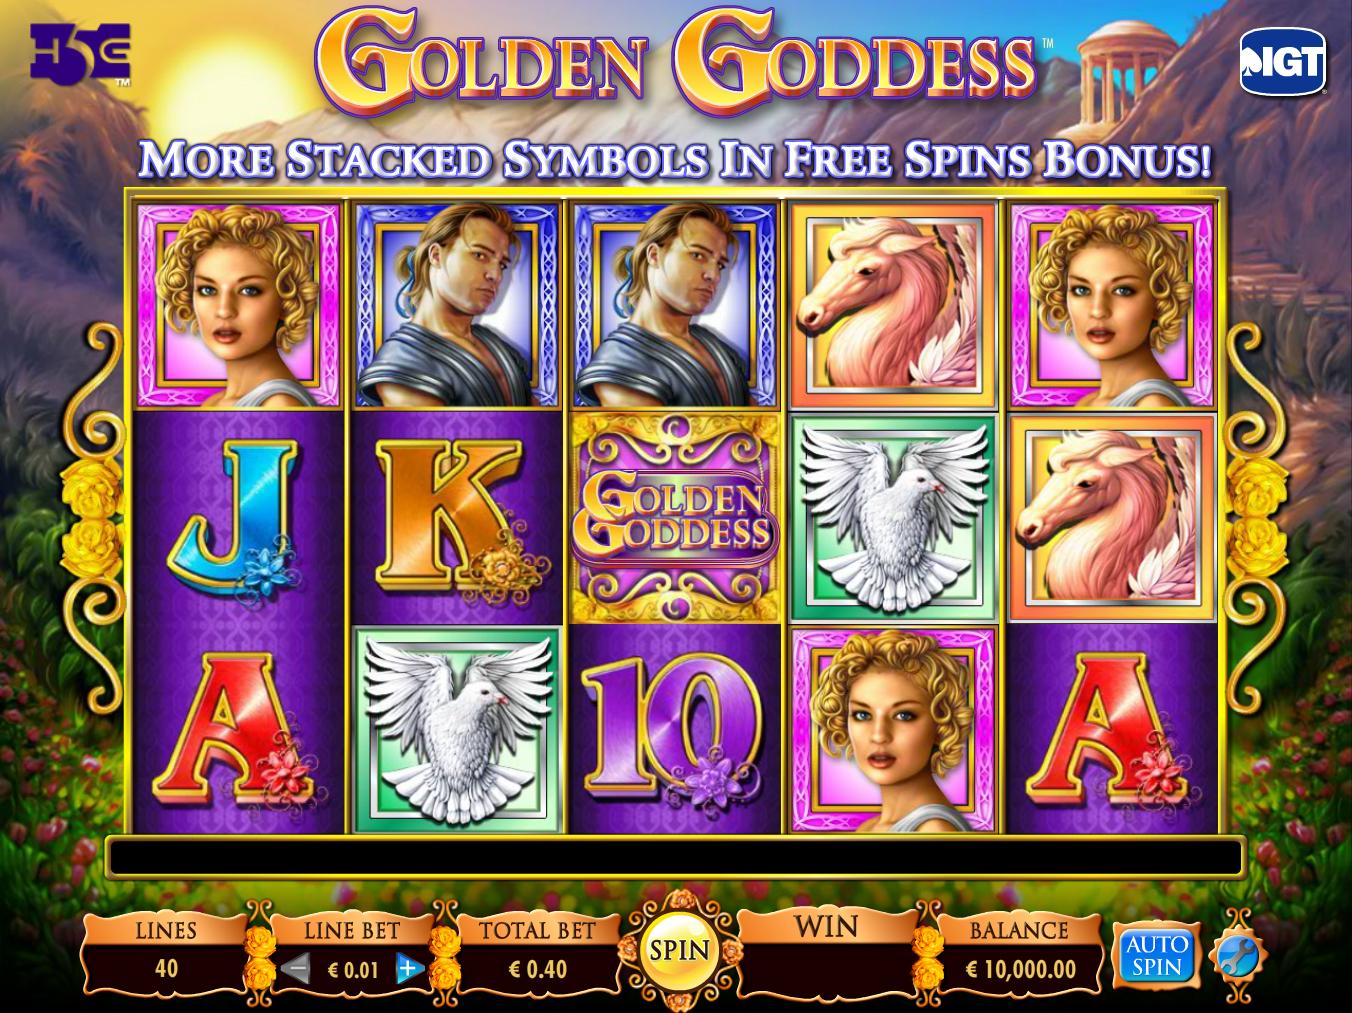 GoldenGoddess_screenBaseGame